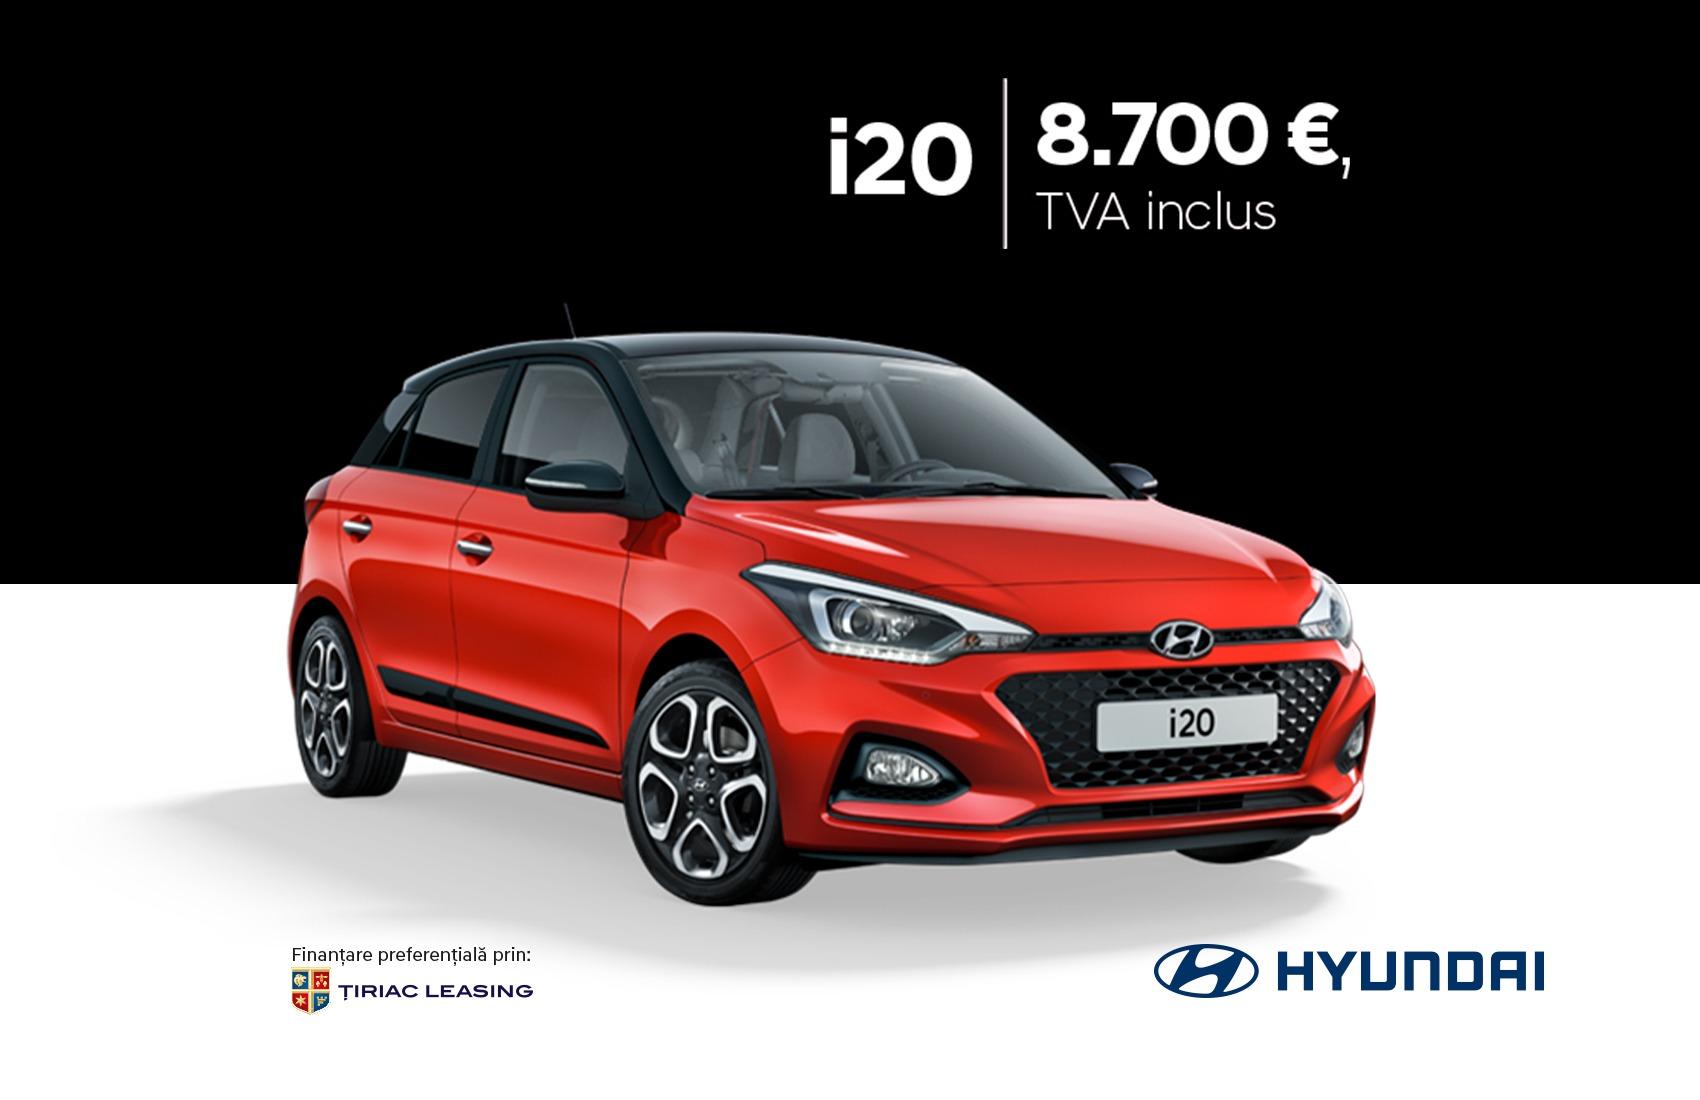 Hyundai i20 prin programul Remat: 8.700 €, TVA inclus